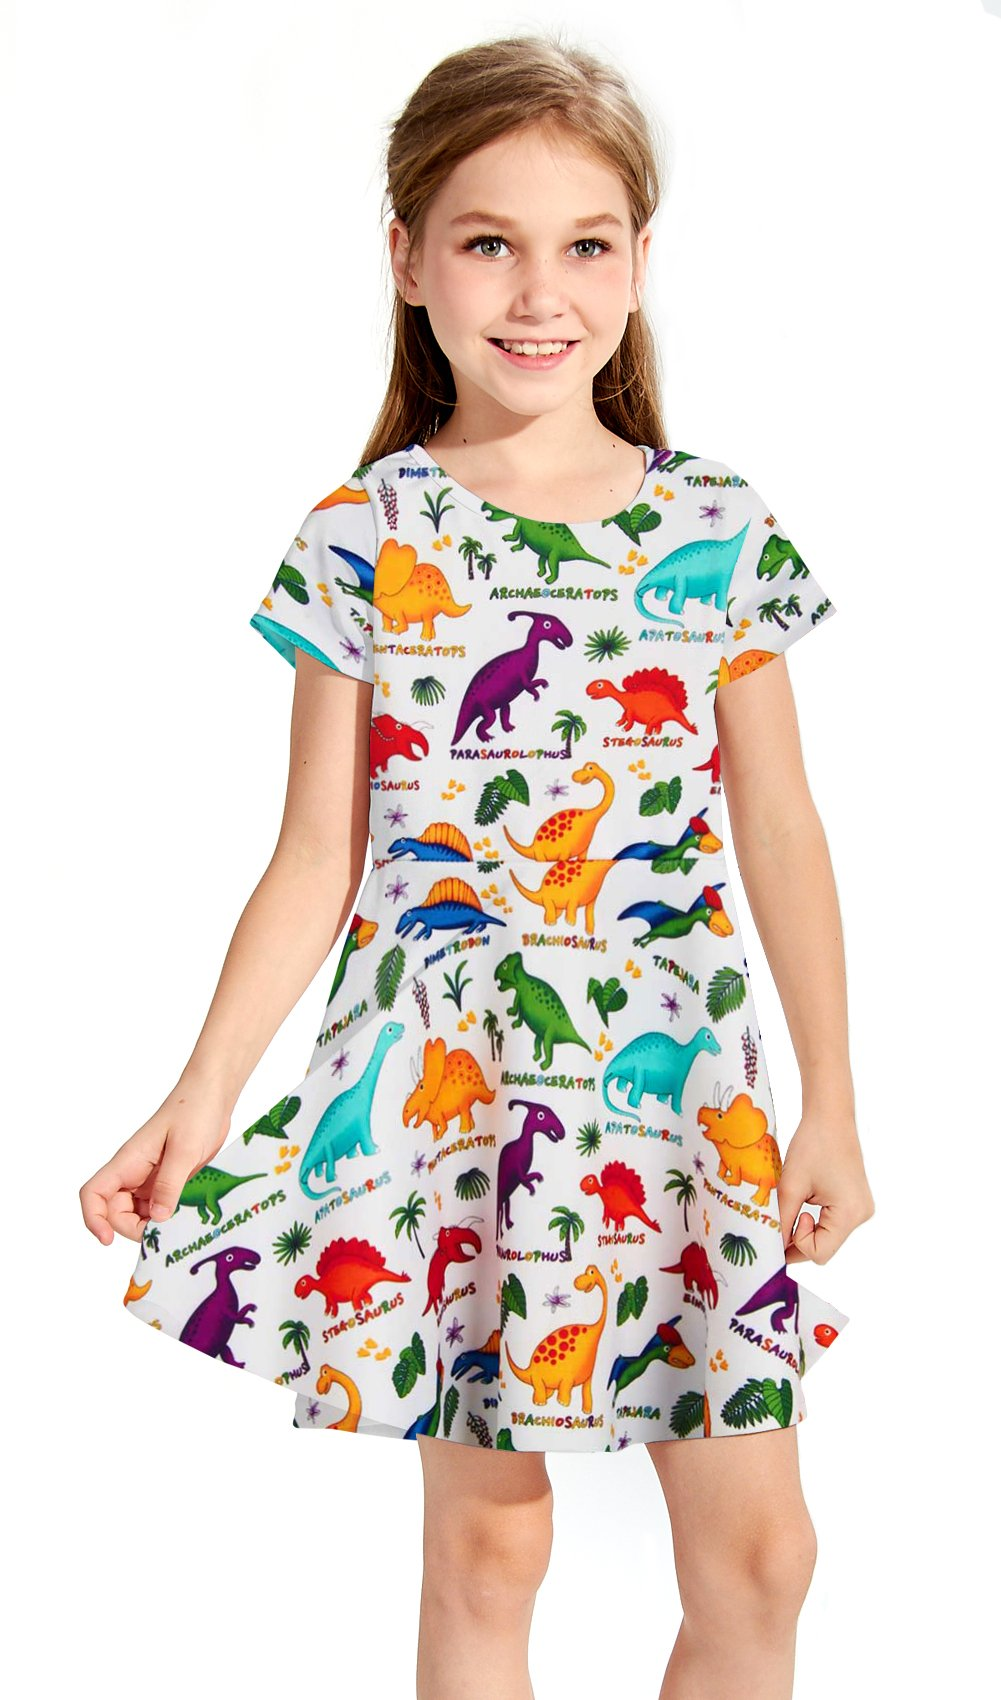 RAISEVERN Girls Summer Short Sleeve Dress Dinosaurs Printing Casual Dress Kids 8-9 Years by RAISEVERN (Image #2)